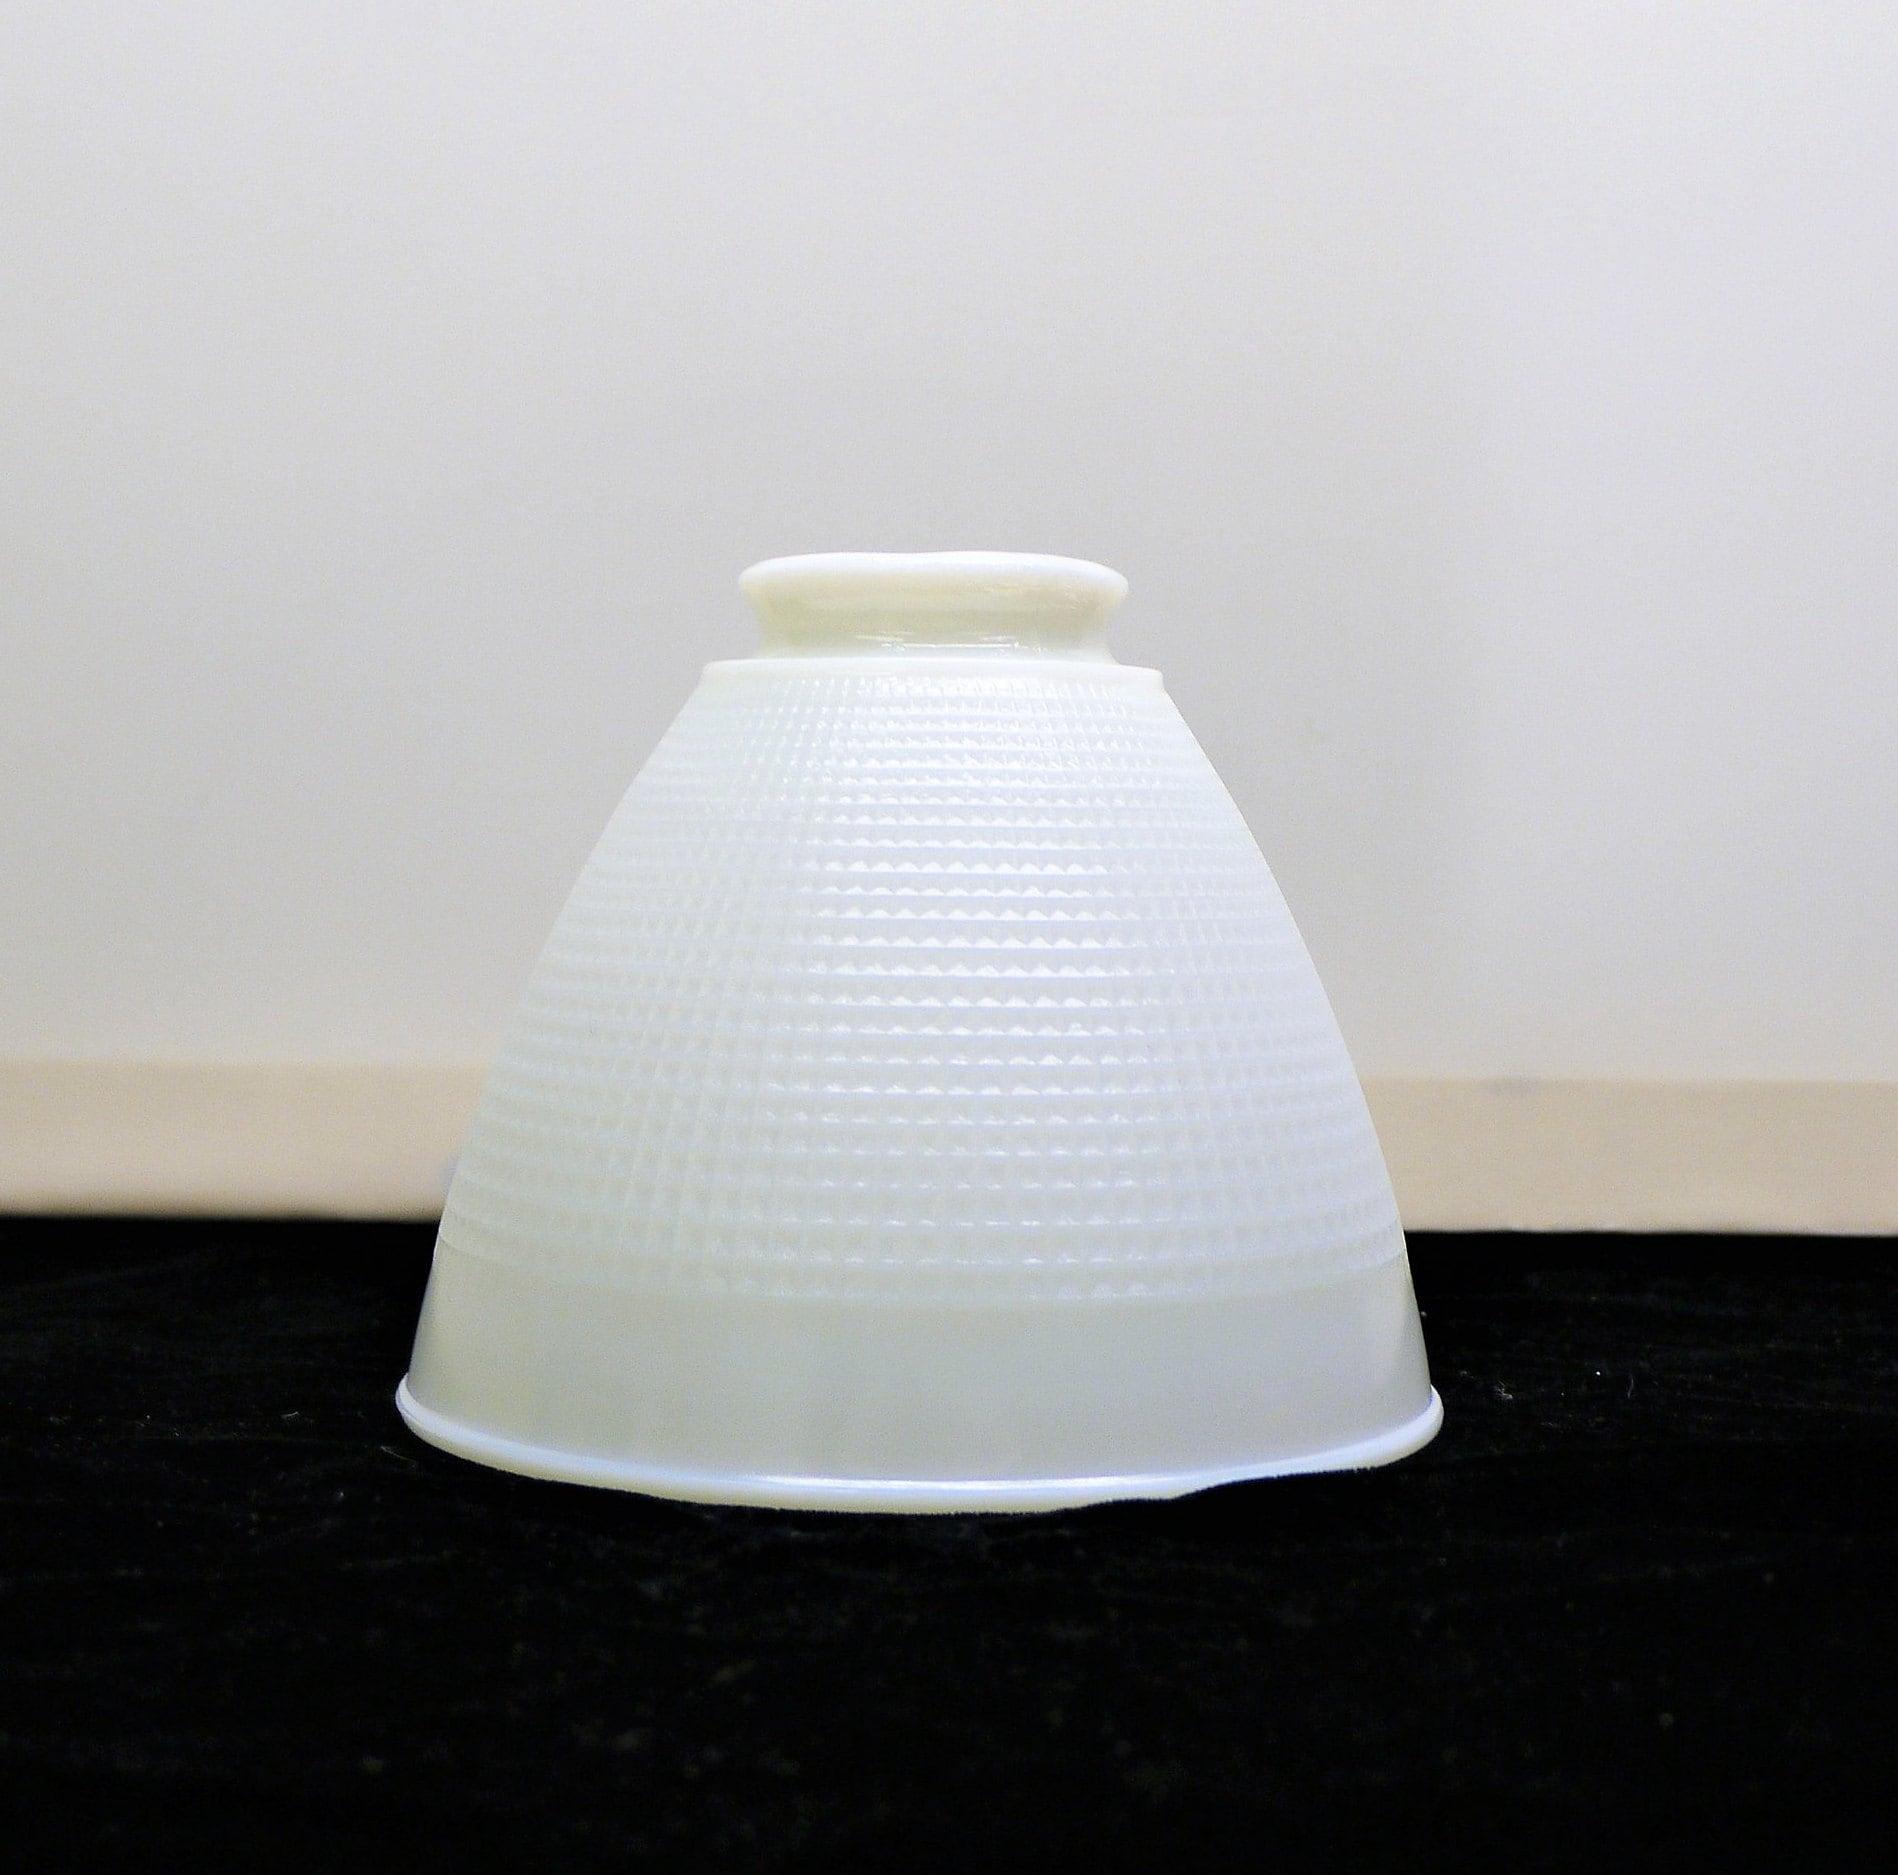 Vintage lamp shade stiffel lamp shade milk glass lamp shade zoom aloadofball Images